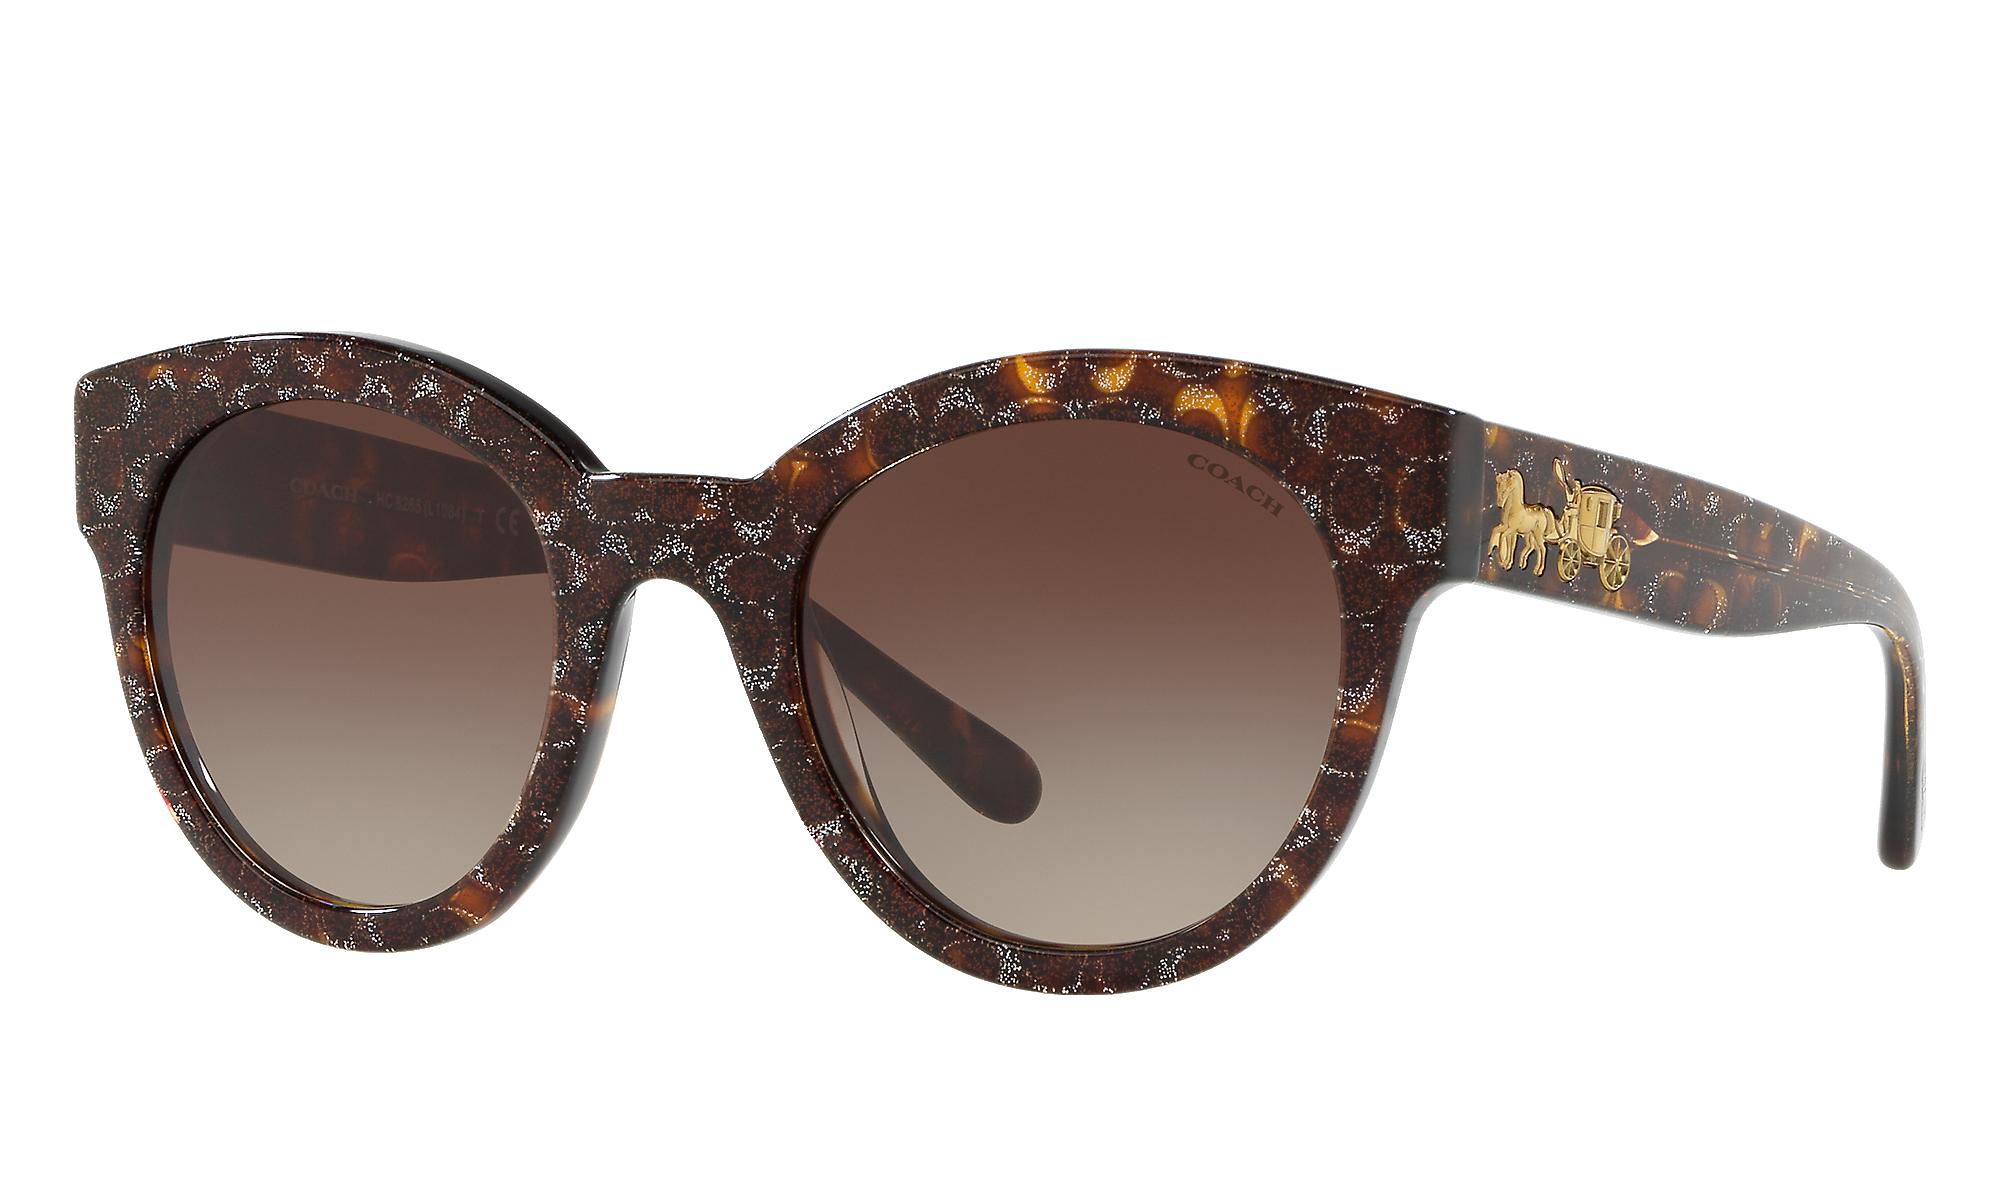 Coach L1084 | Glasses.com® | Free Shipping